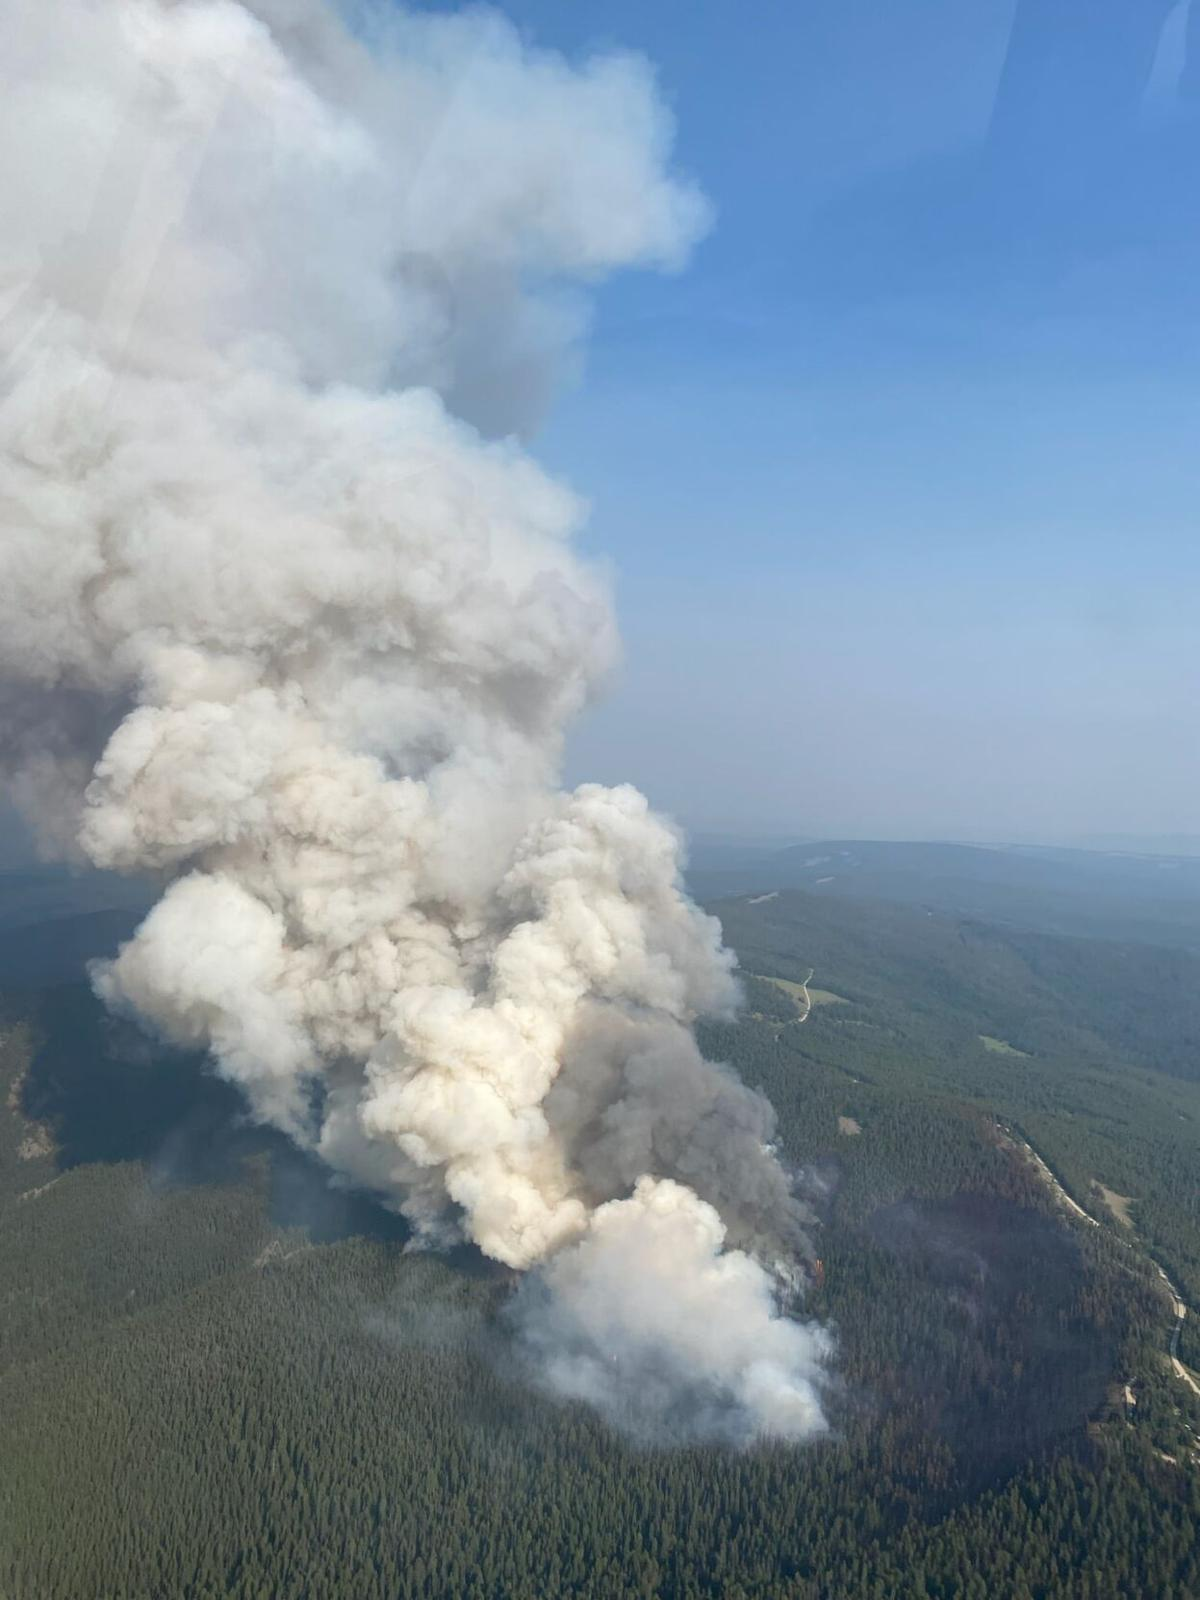 Balsinger Fire